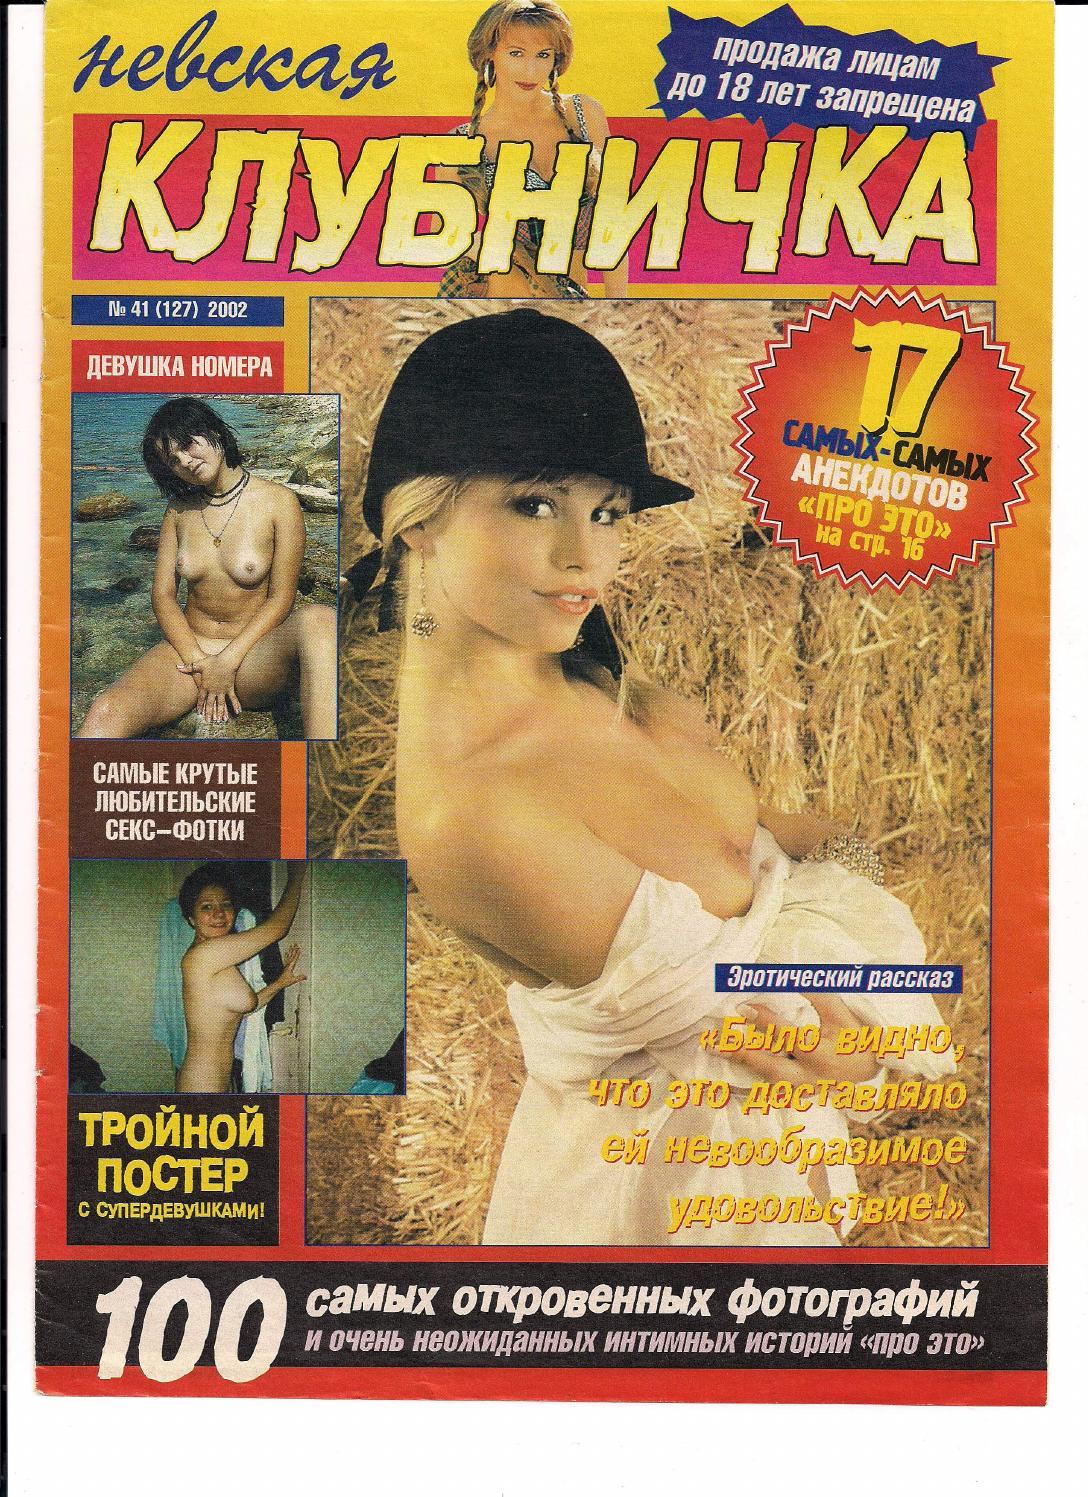 porno-zhurnal-na-russkom